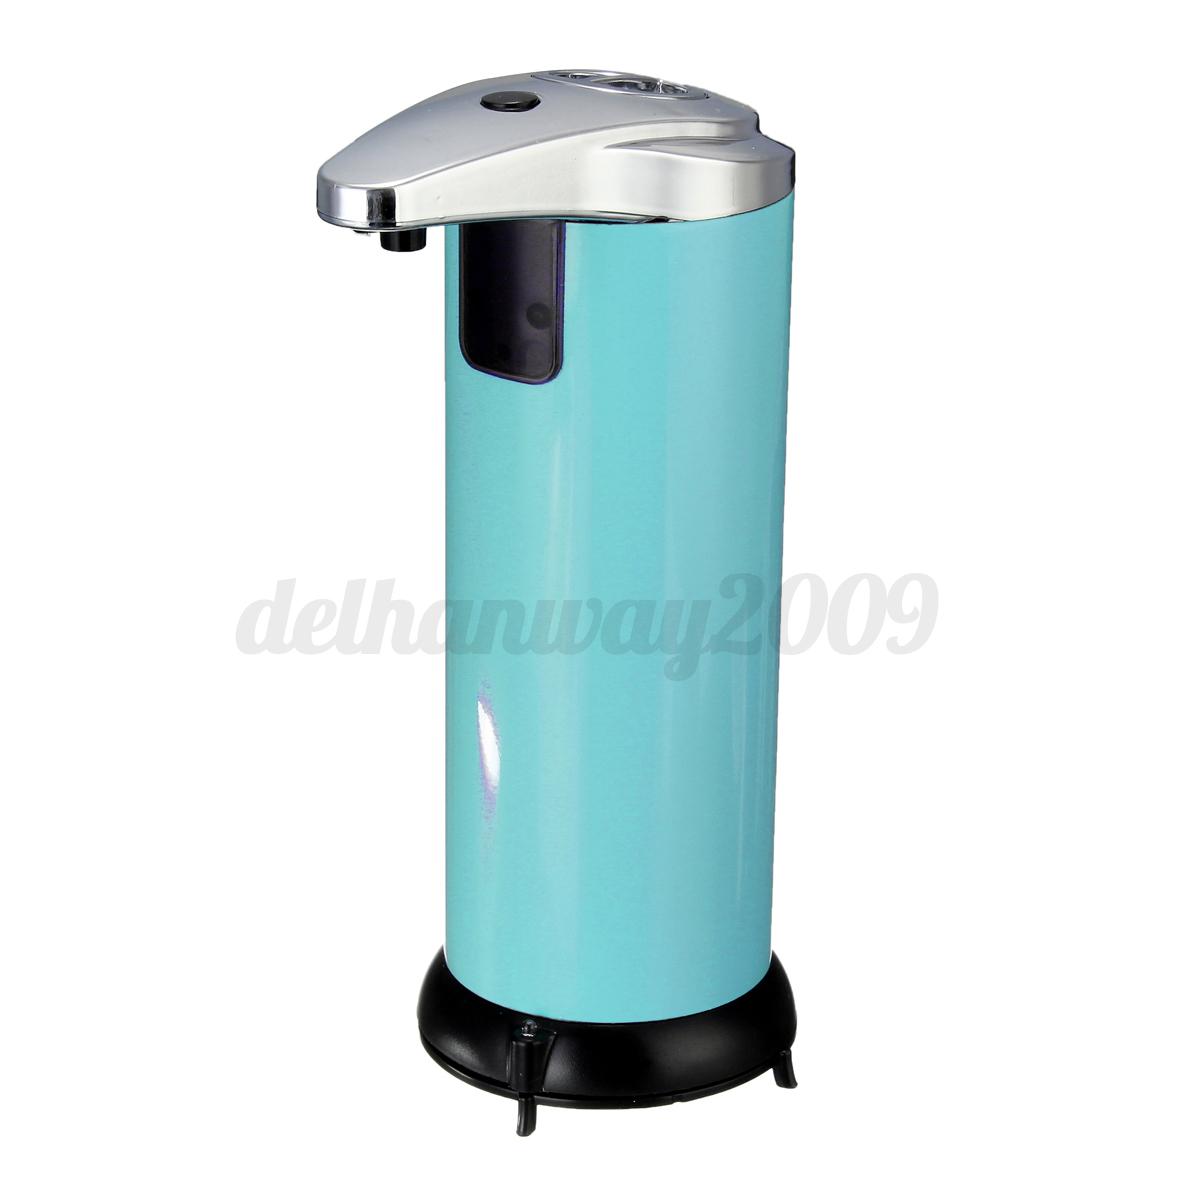 Automatic Sensor Soap Sanitizer Dispenser Handsfree Touch